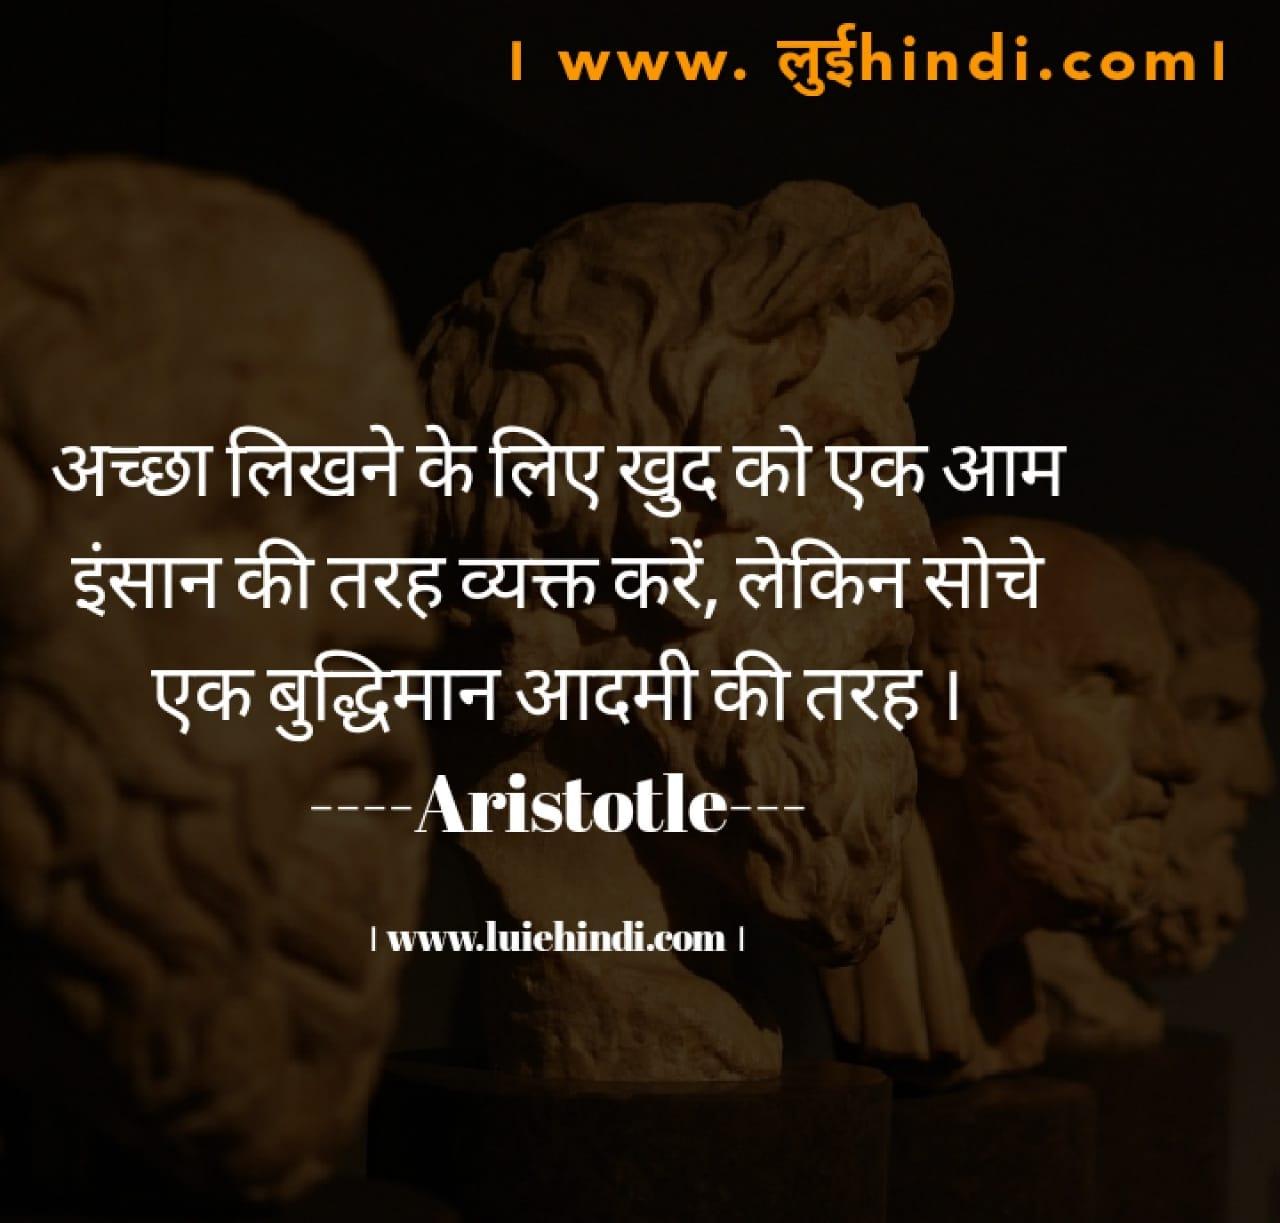 Aristotle photo -www.luiehindi.com